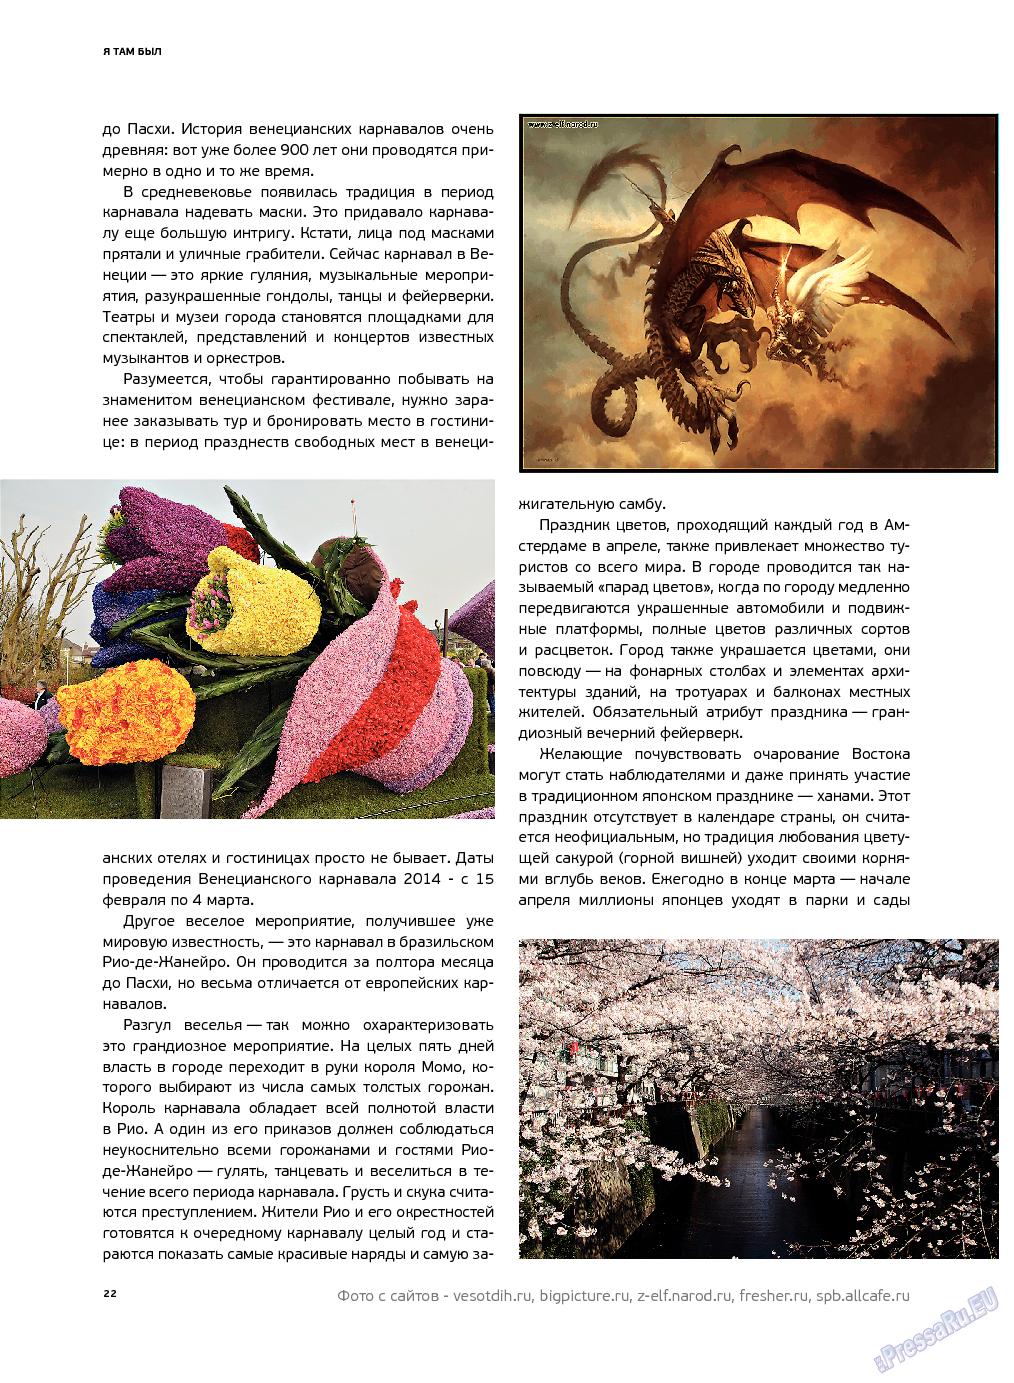 Артек (журнал). 2013 год, номер 4, стр. 24